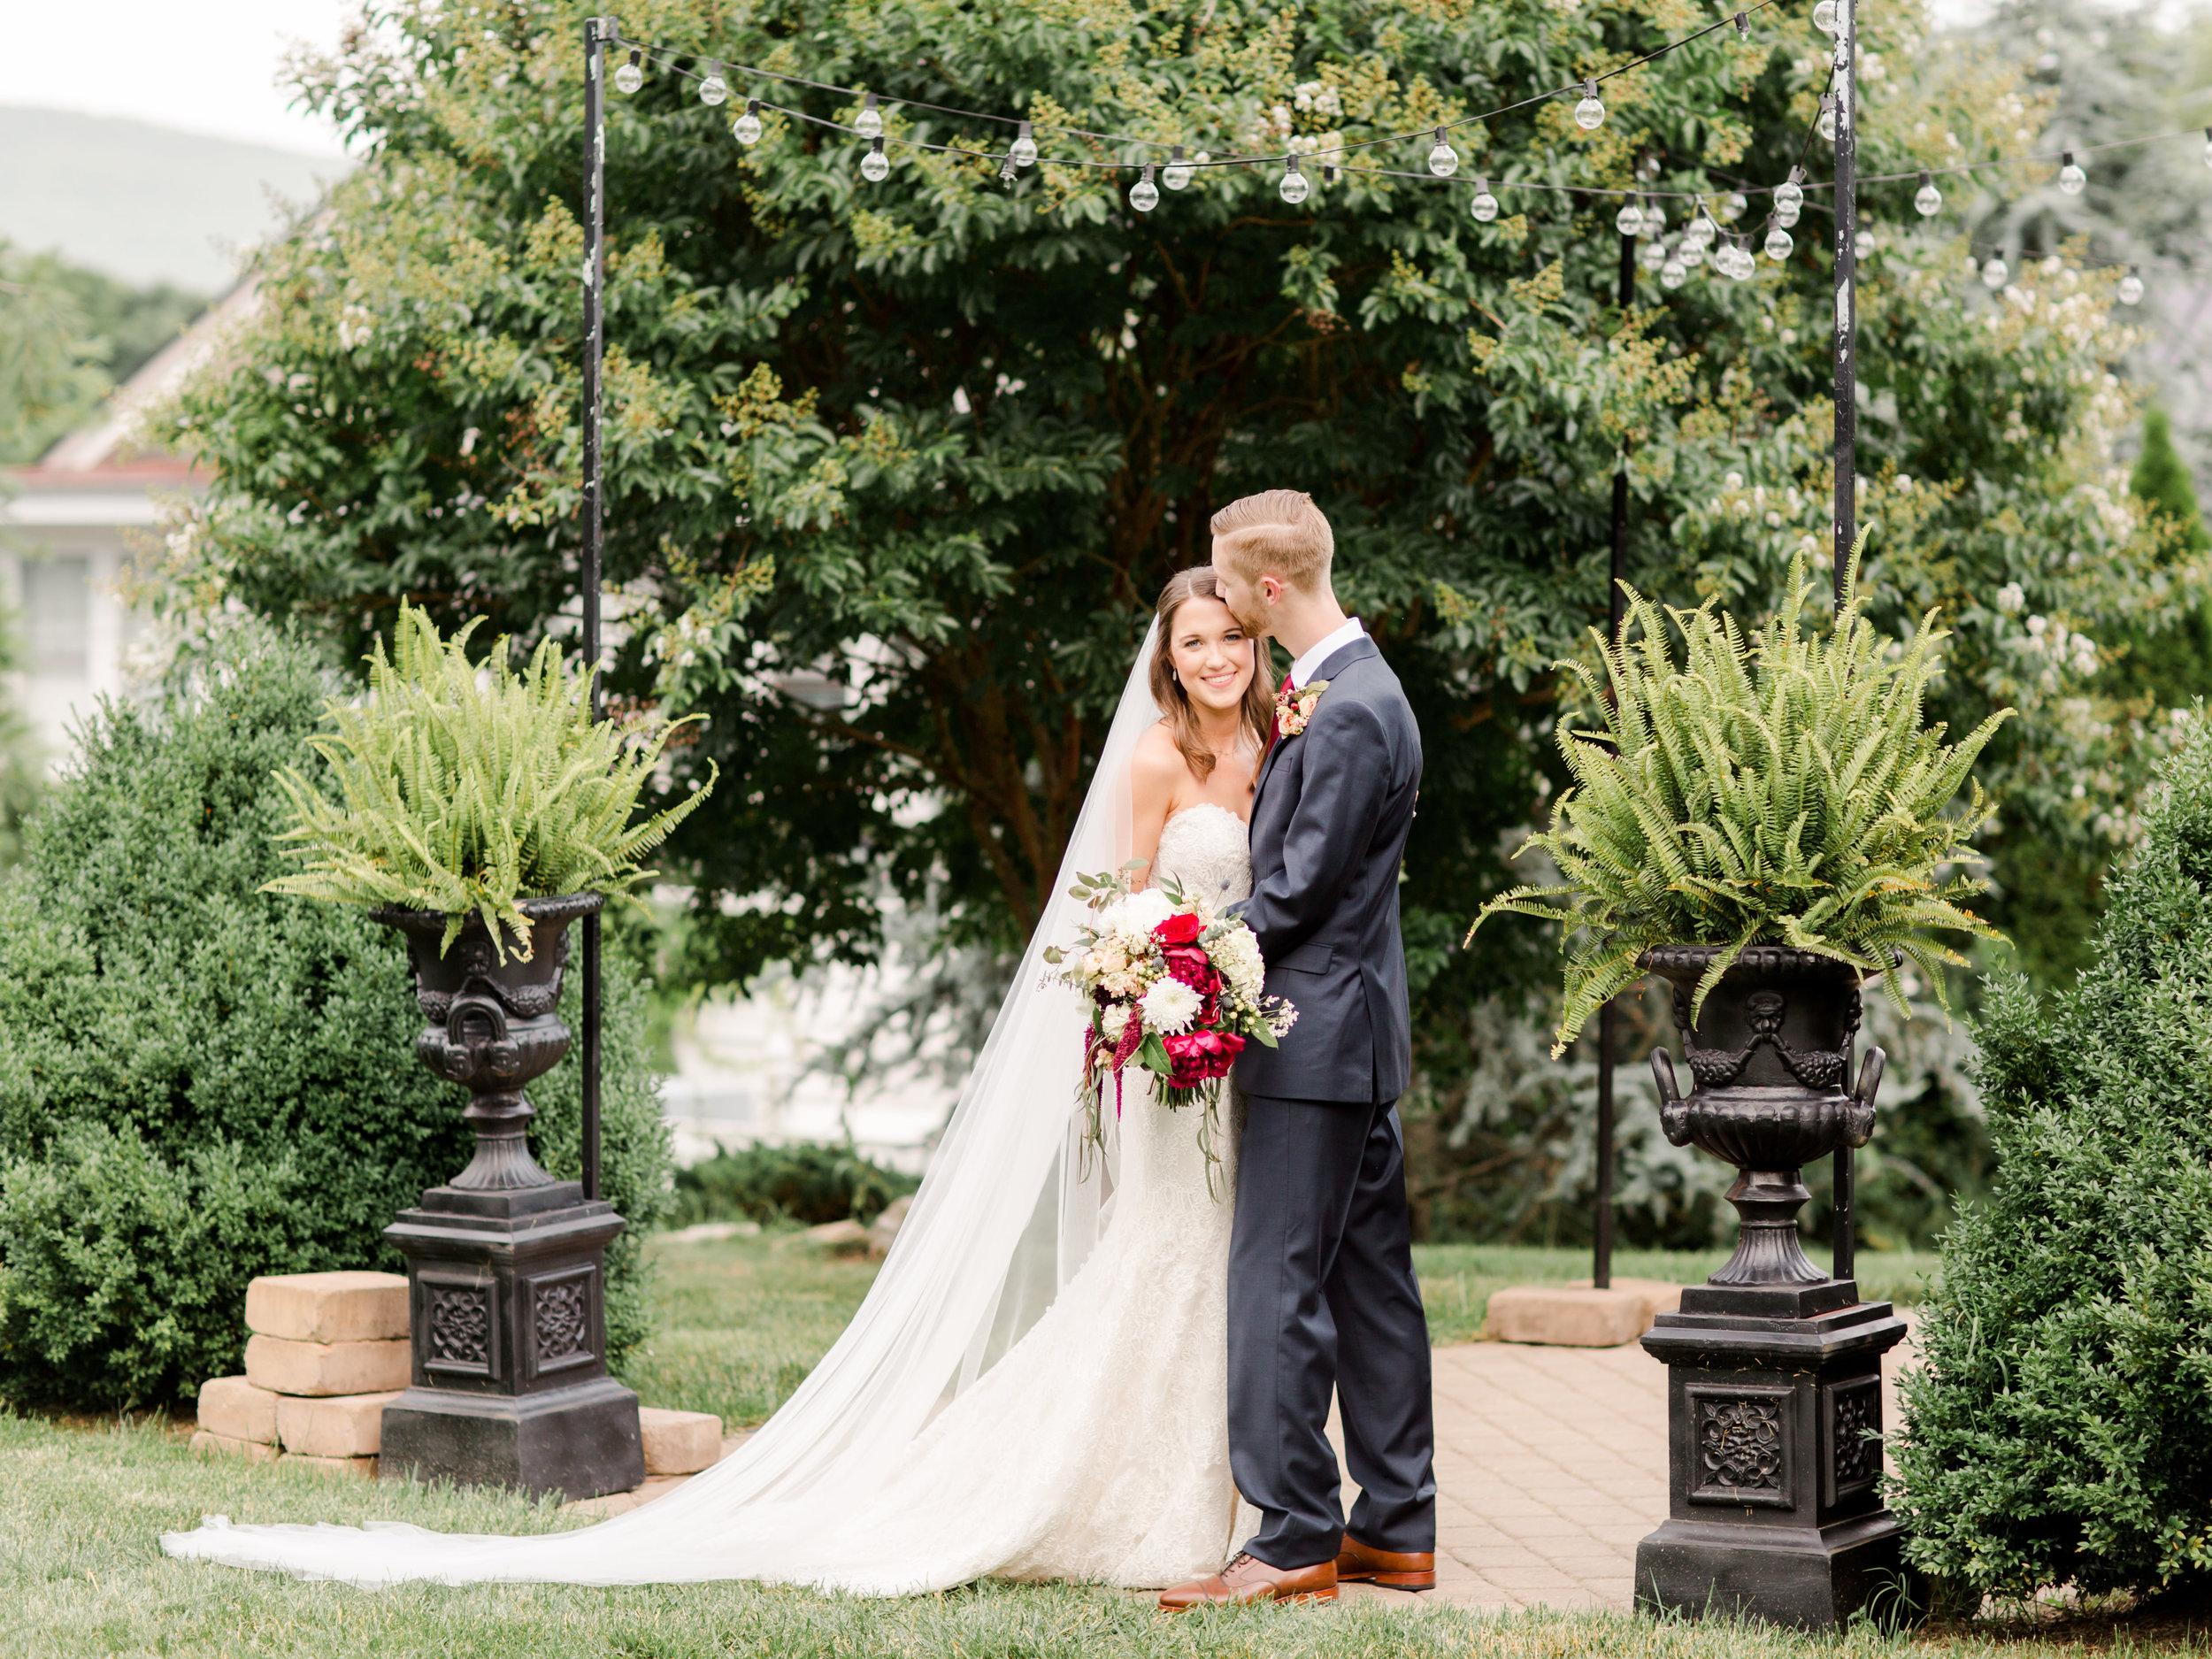 roanoke-virginia-wedding-photographer-plantation-on-sunnybrook-meredith-and-logan-899.jpg